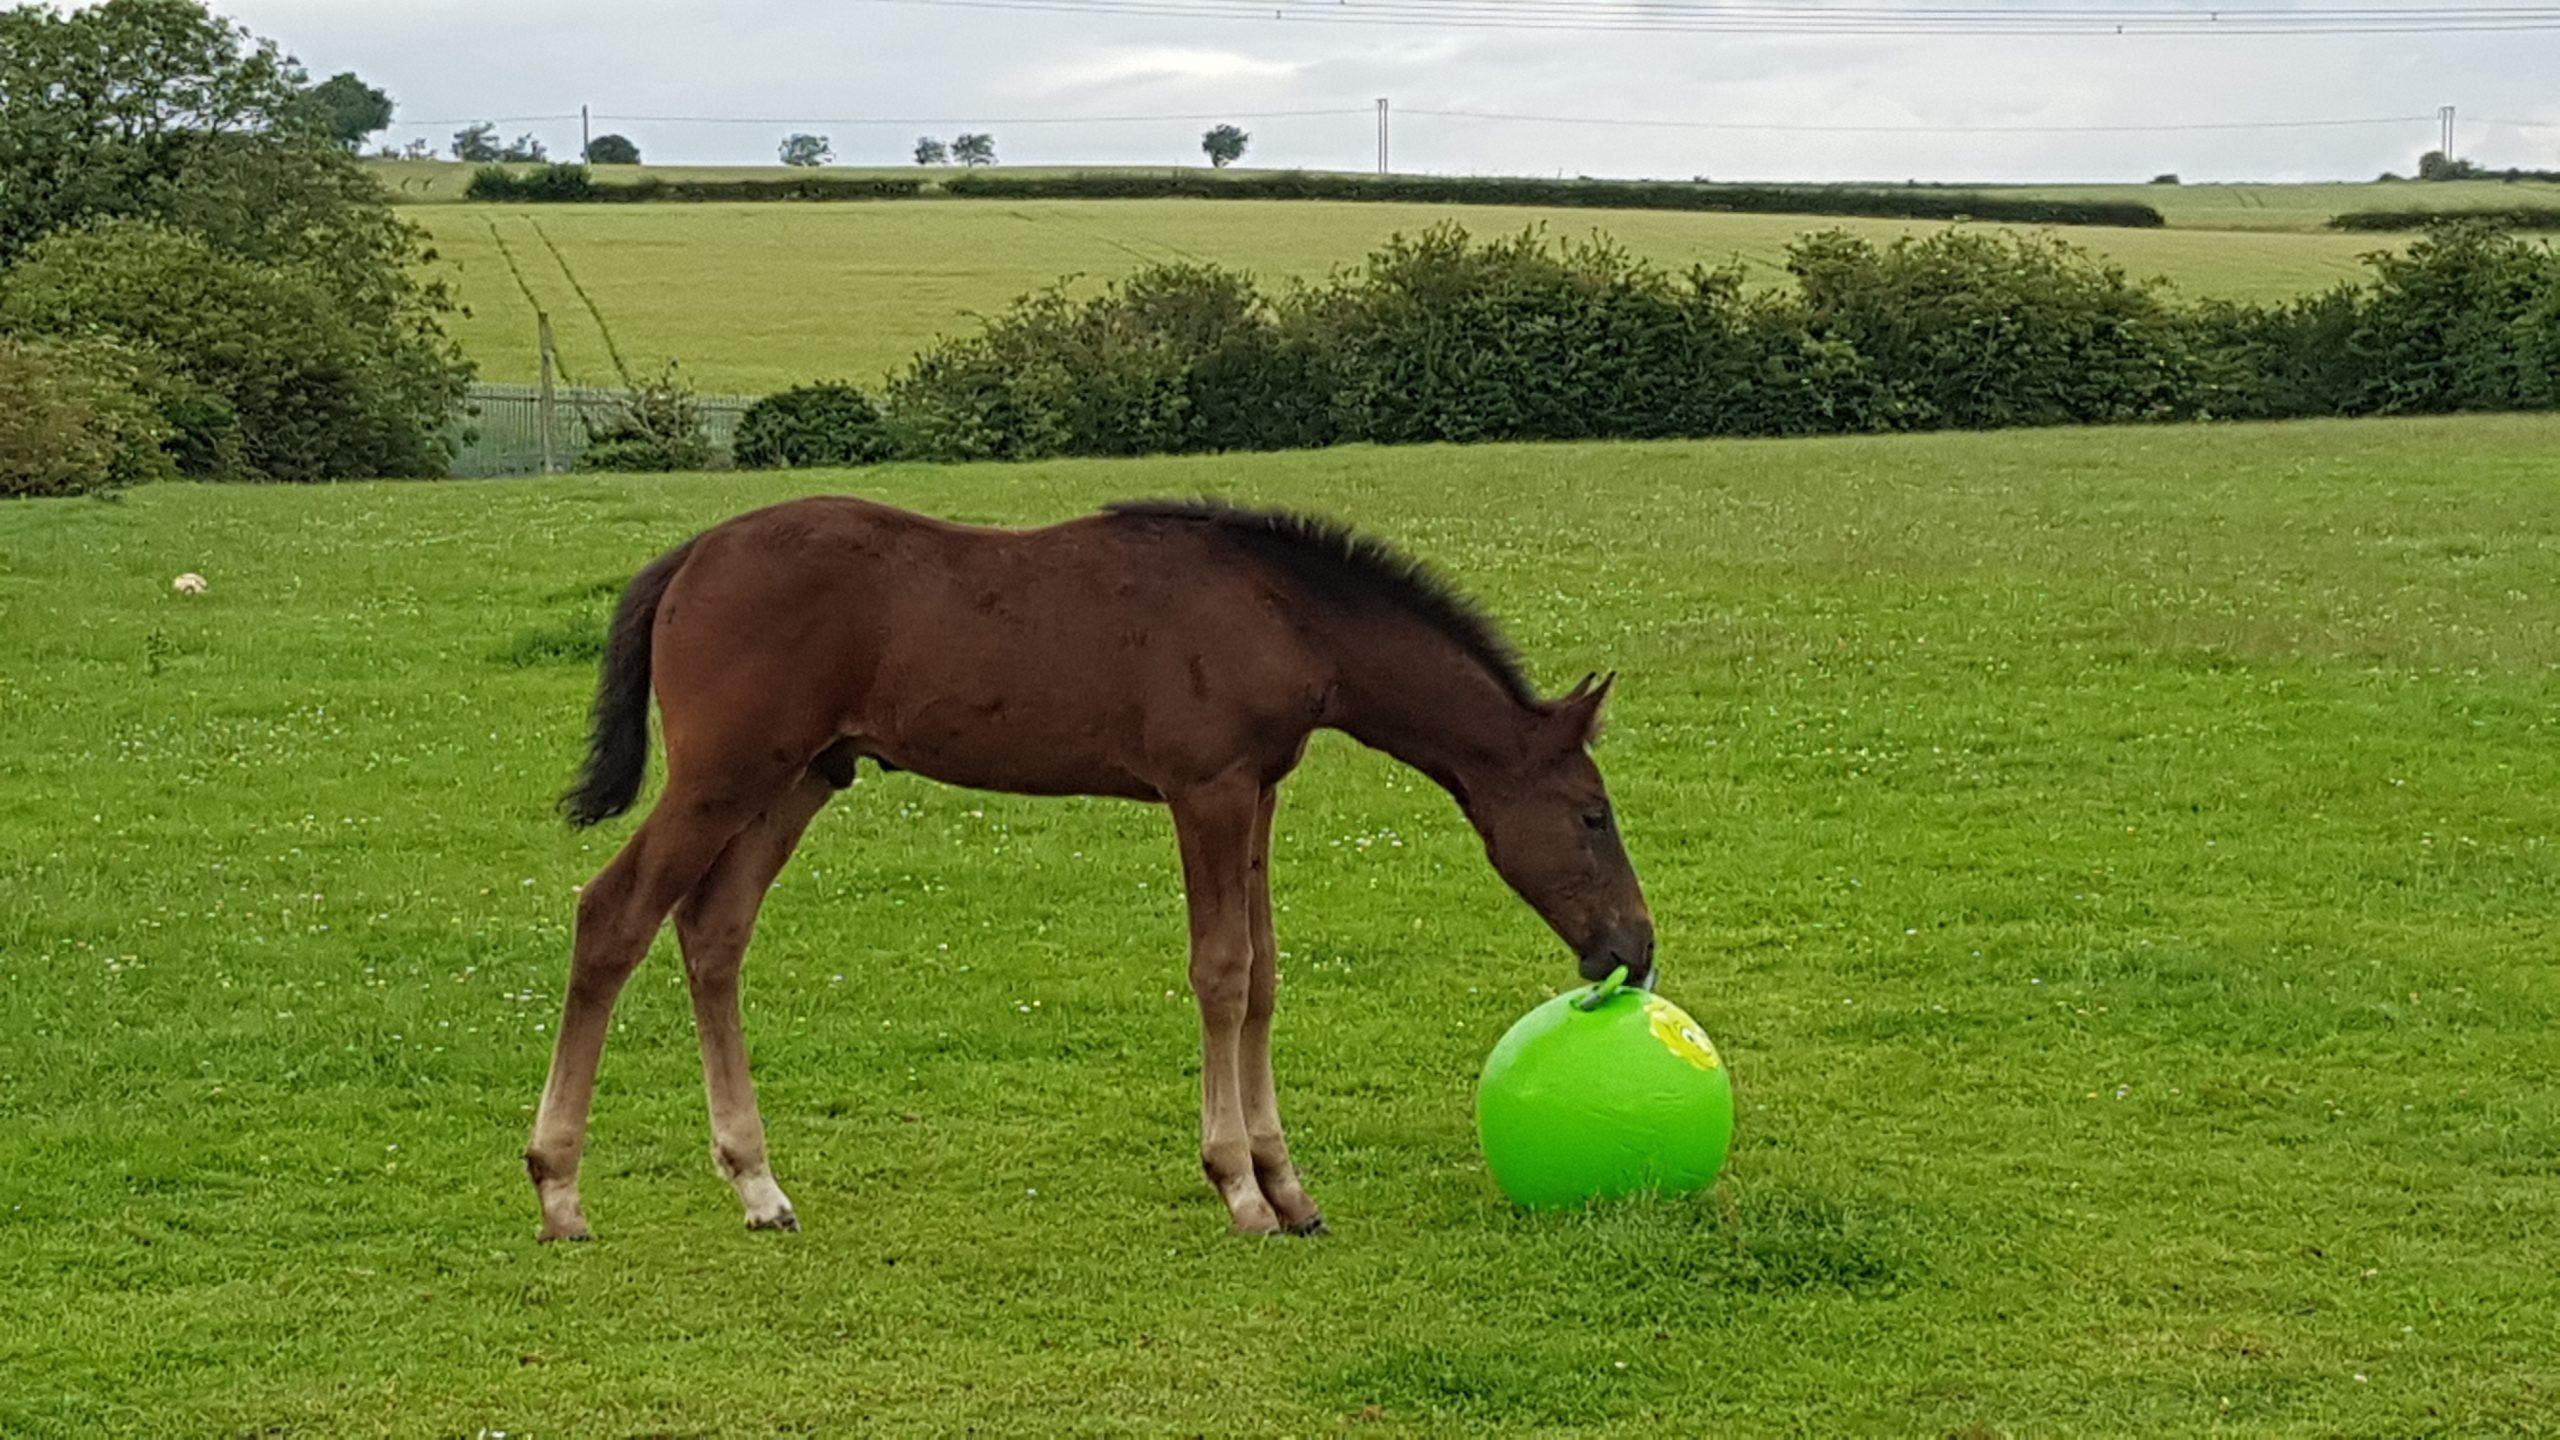 Foal play